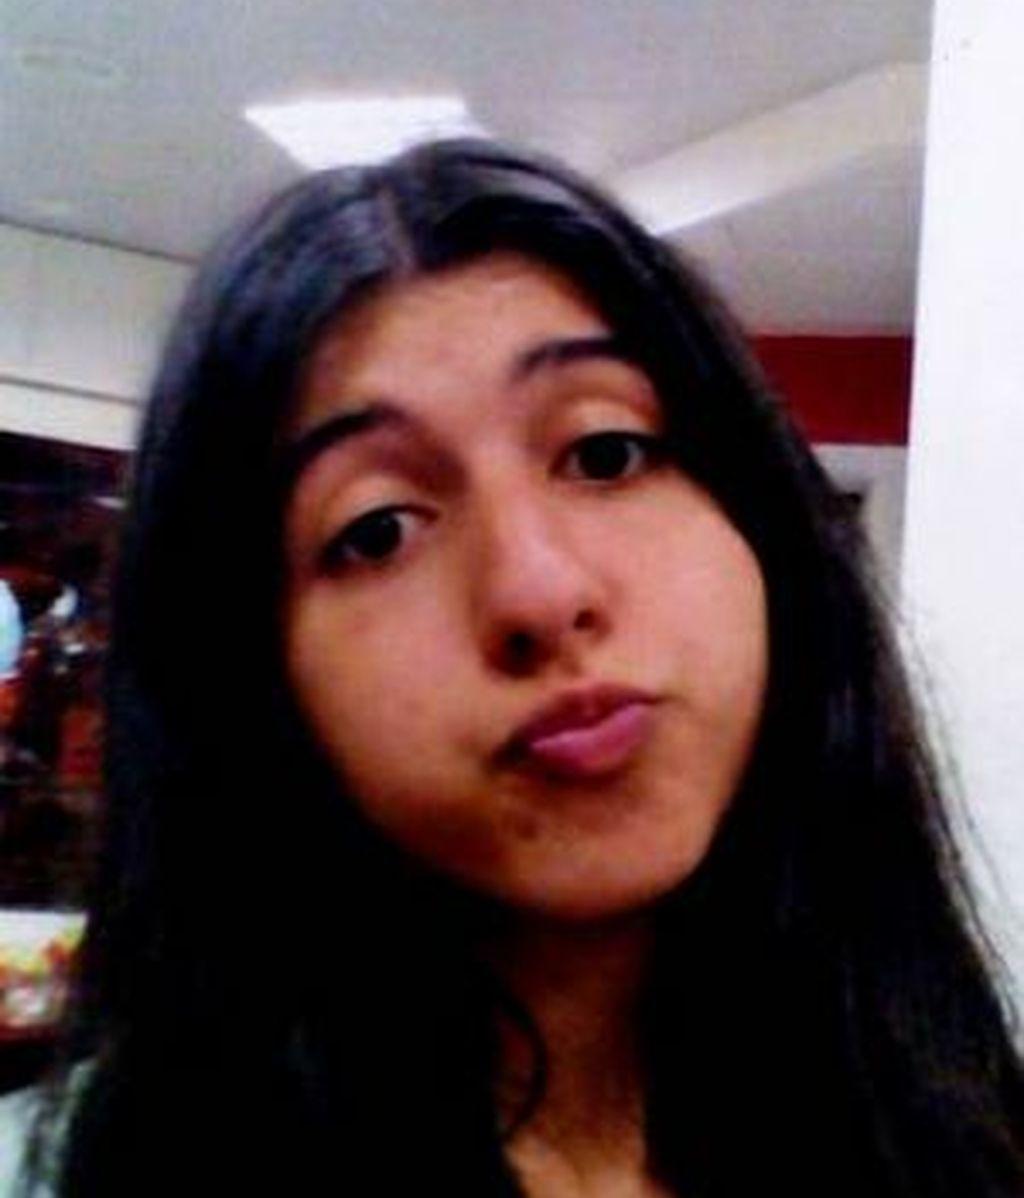 Andrea, adolescente desaparecida Pontevedra